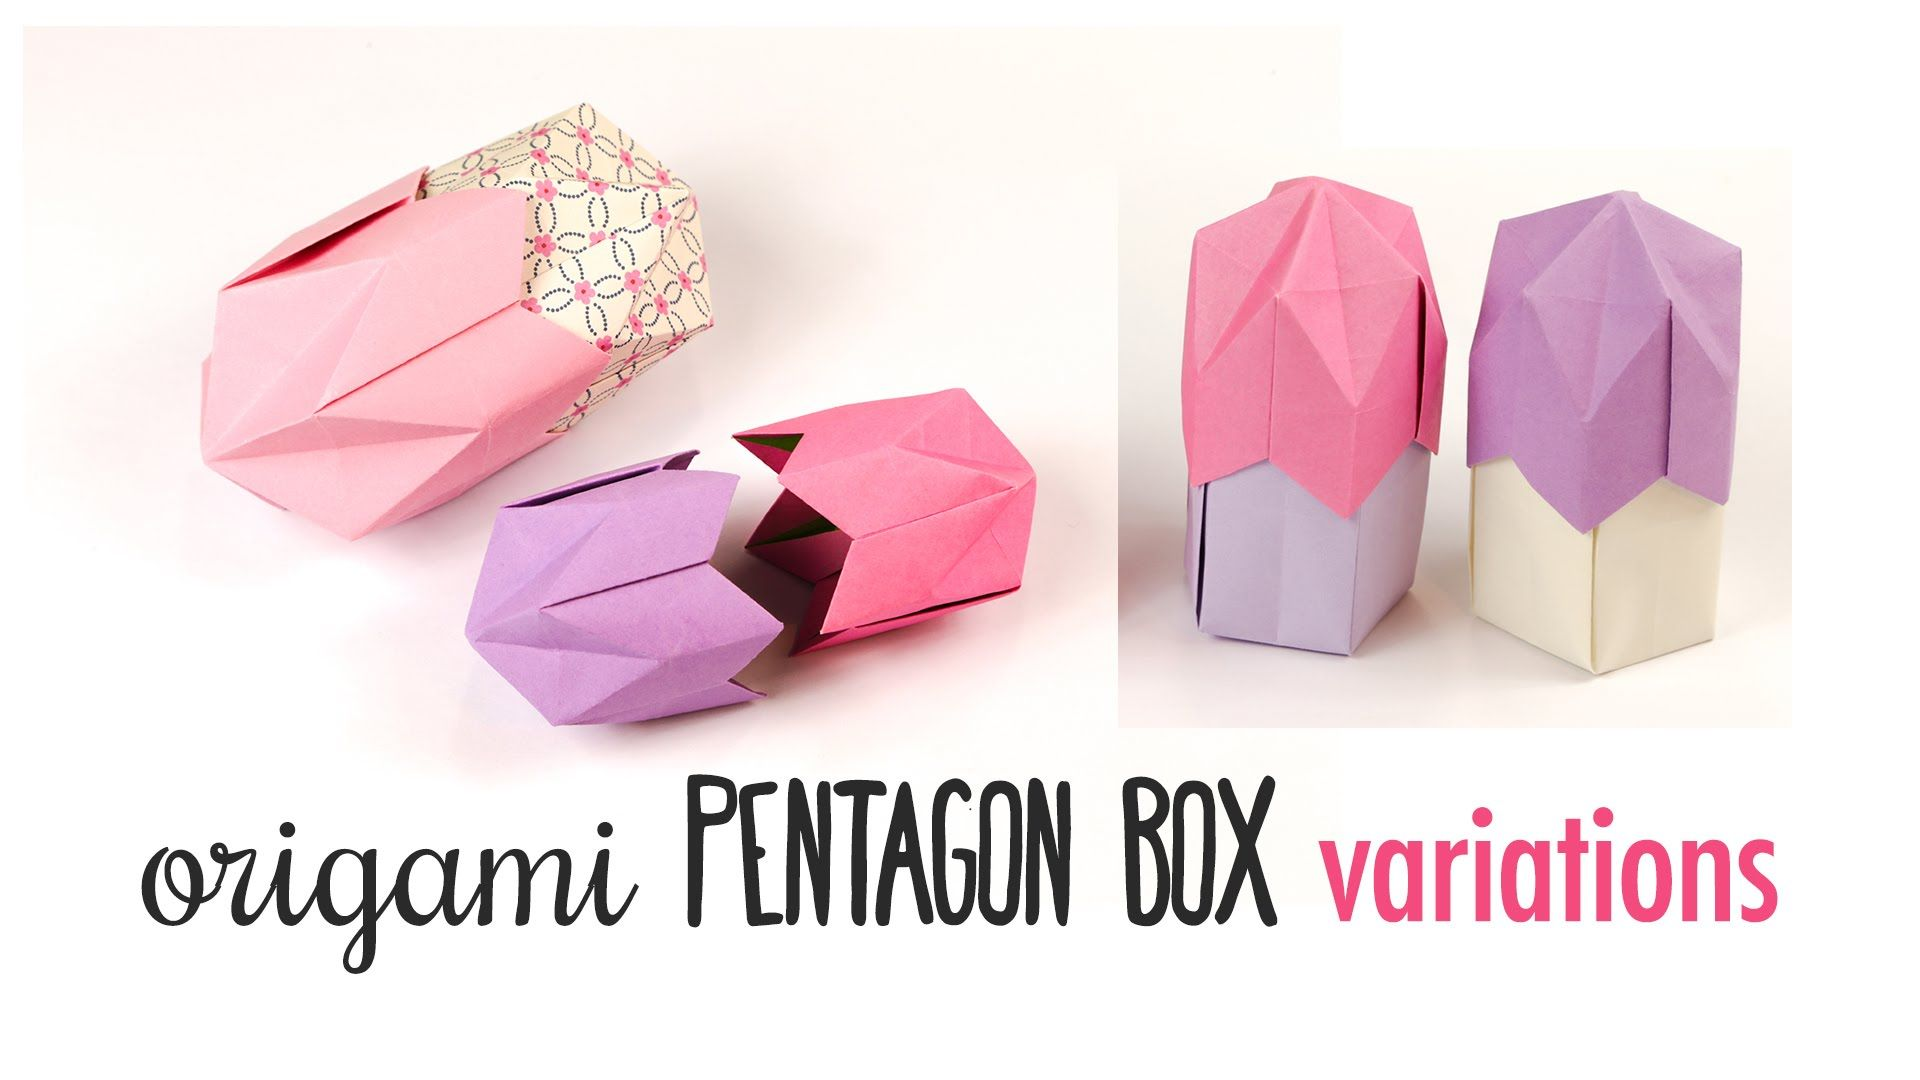 Origami 5 sided gift box tutorial diy gift box origami 5 sided gift box tutorial diy gift box paper jeuxipadfo Gallery